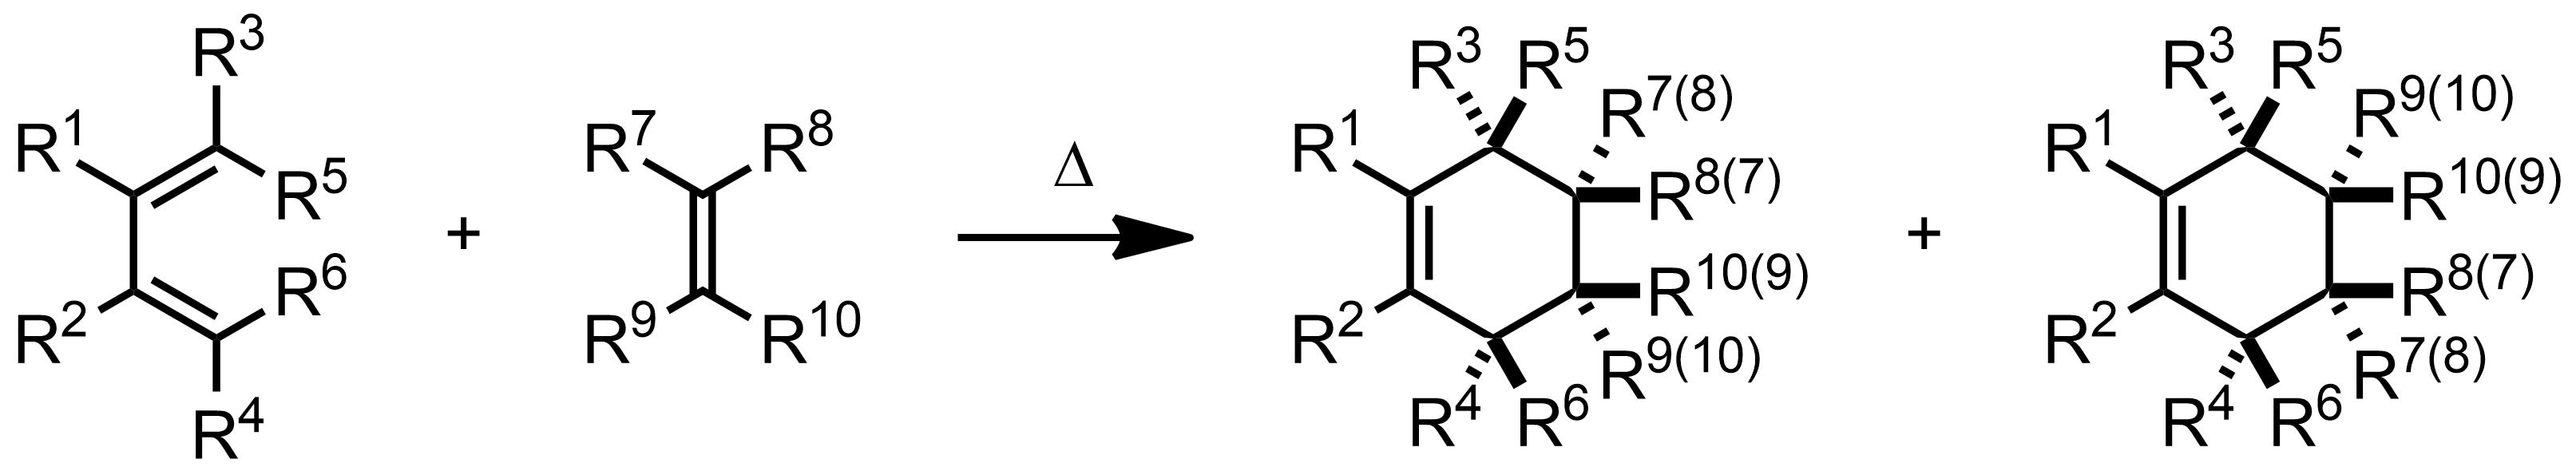 Schematic representation of the Diels-Alder Reaction.